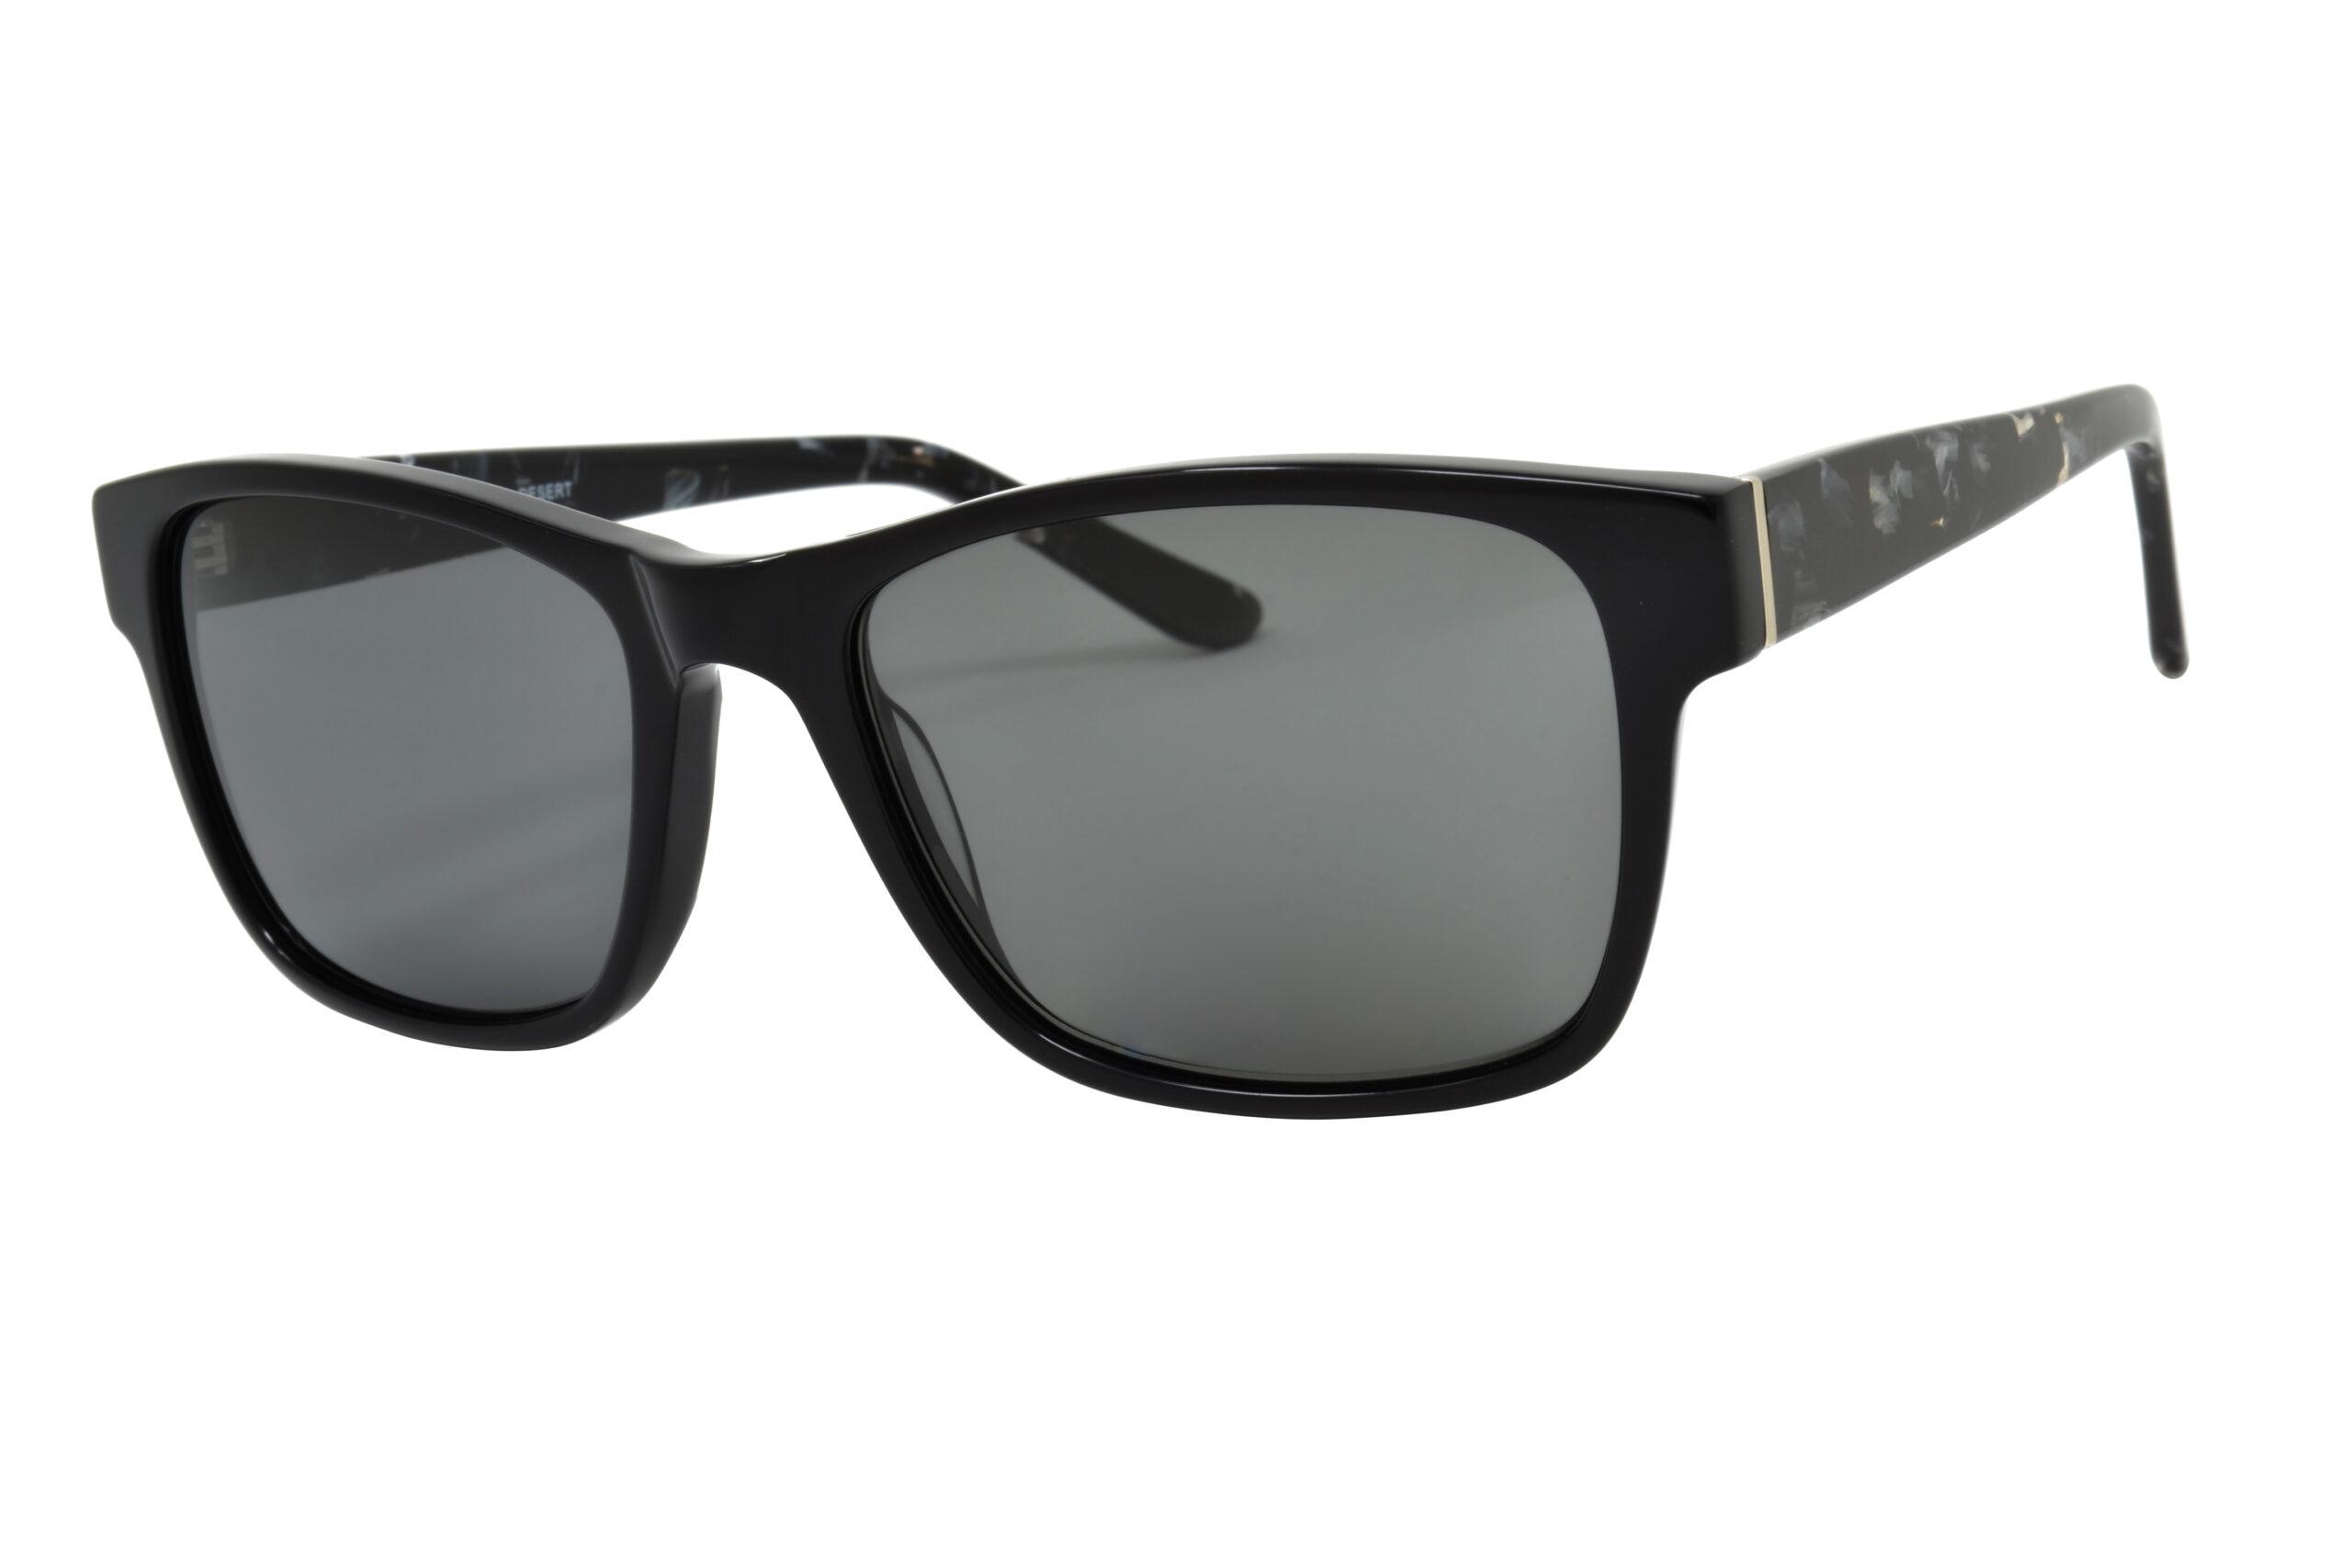 Dolabany Eyewear Desert Black